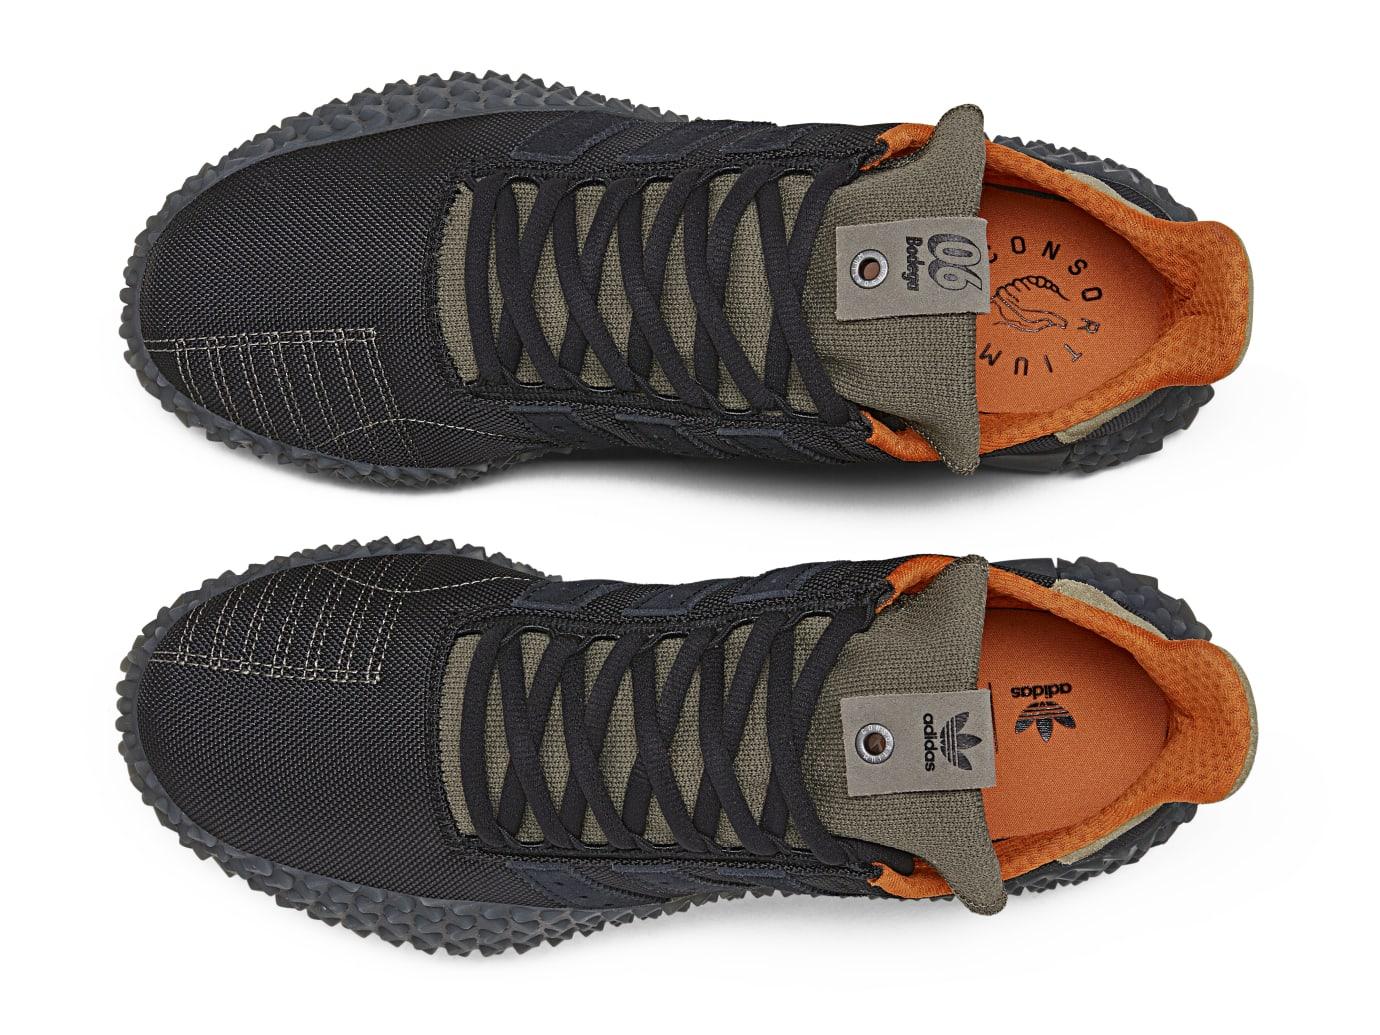 Bodega x Adidas Kamanda BB9243 (Top)